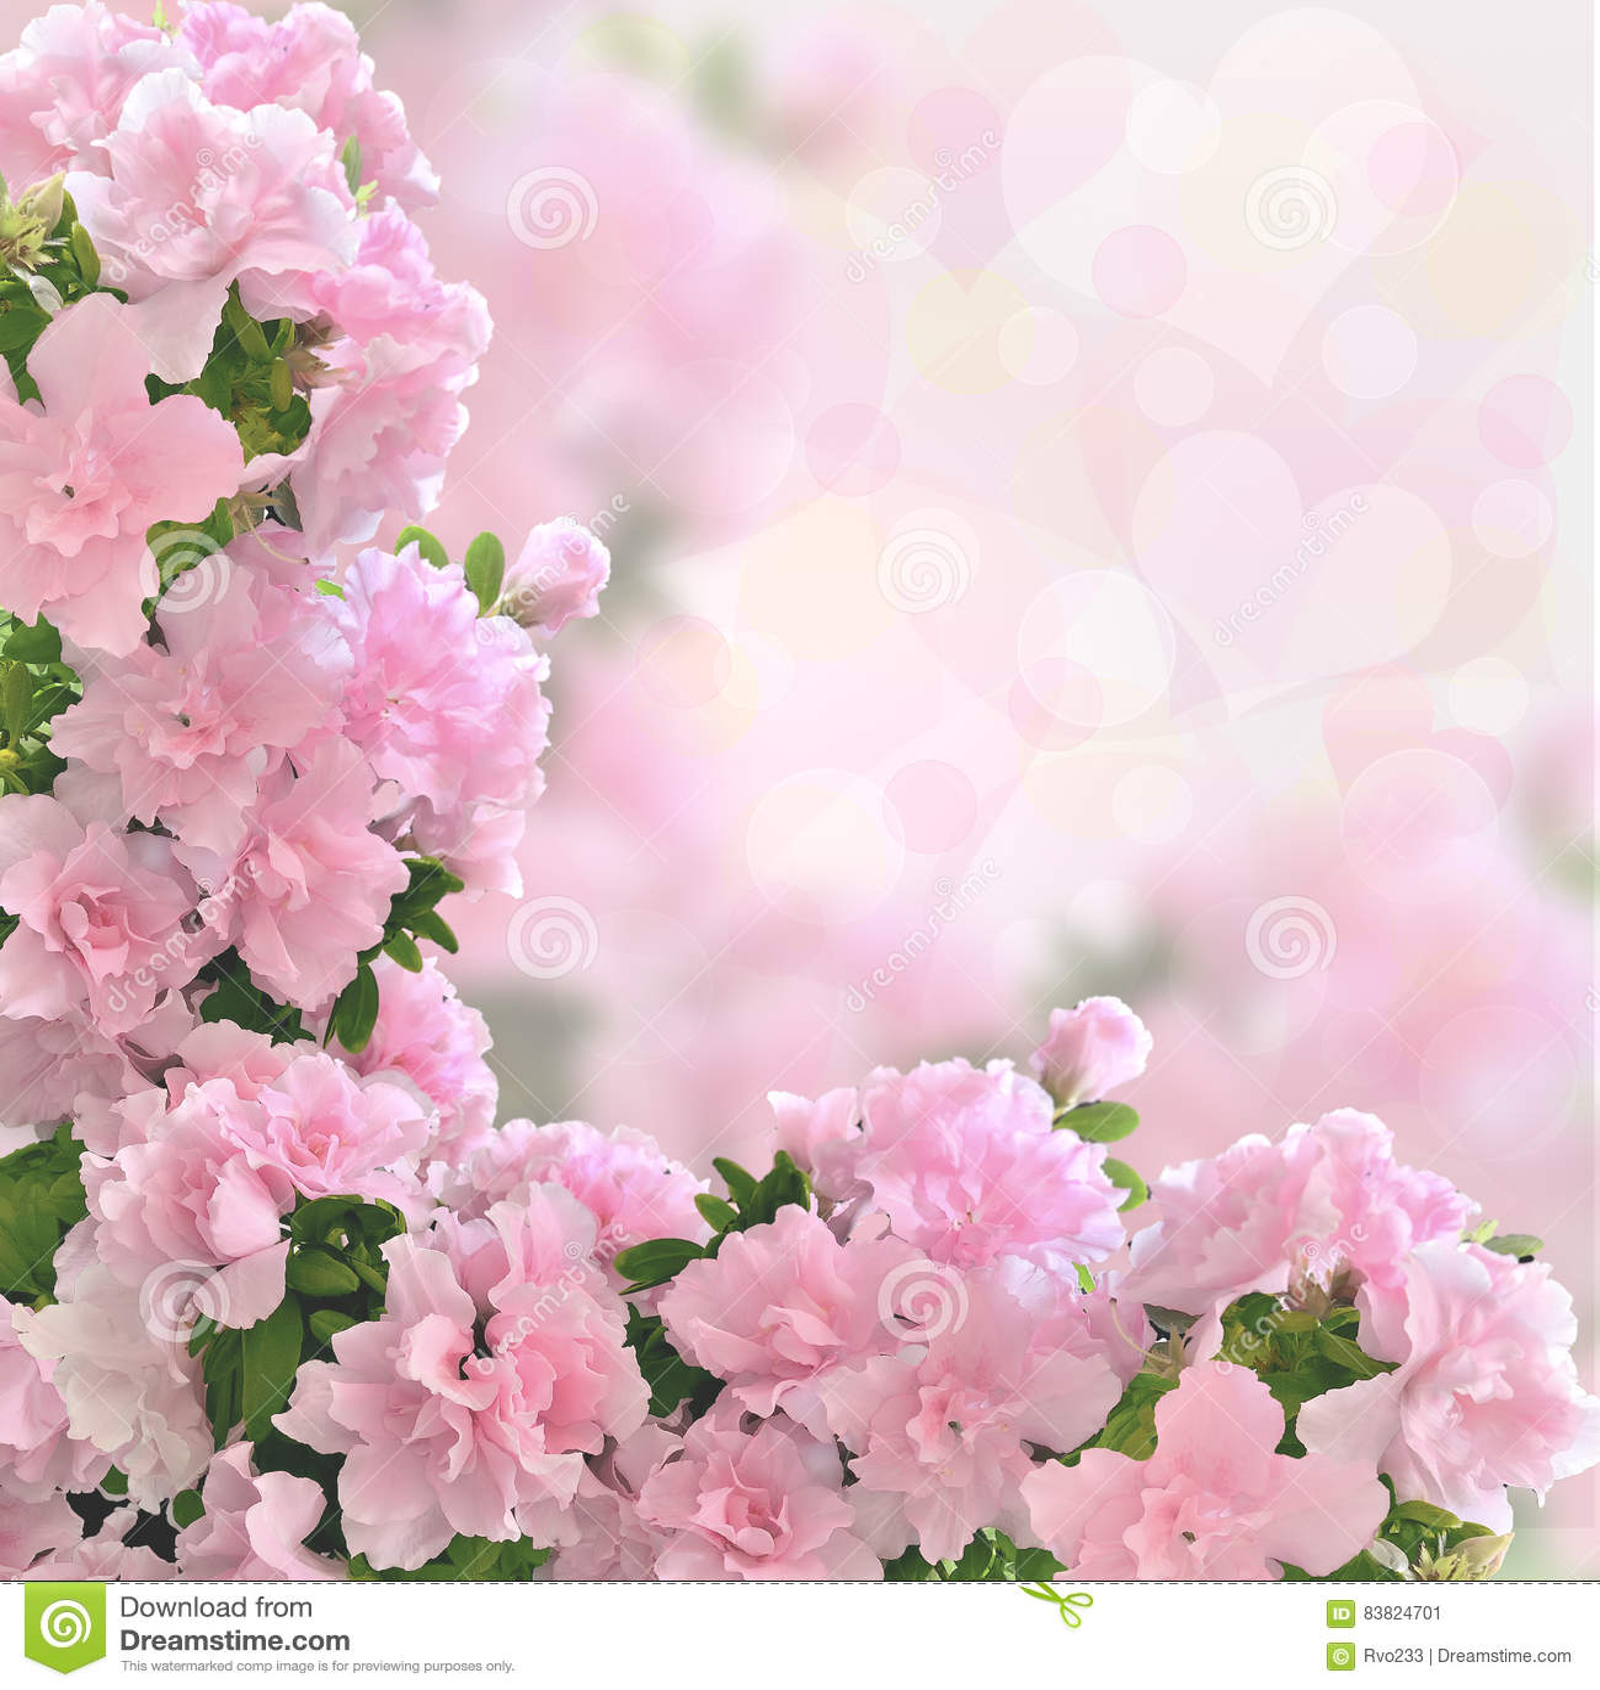 Bokeh Flowers Wedding: Pink Azalea Flowers Romantic Background Stock Image